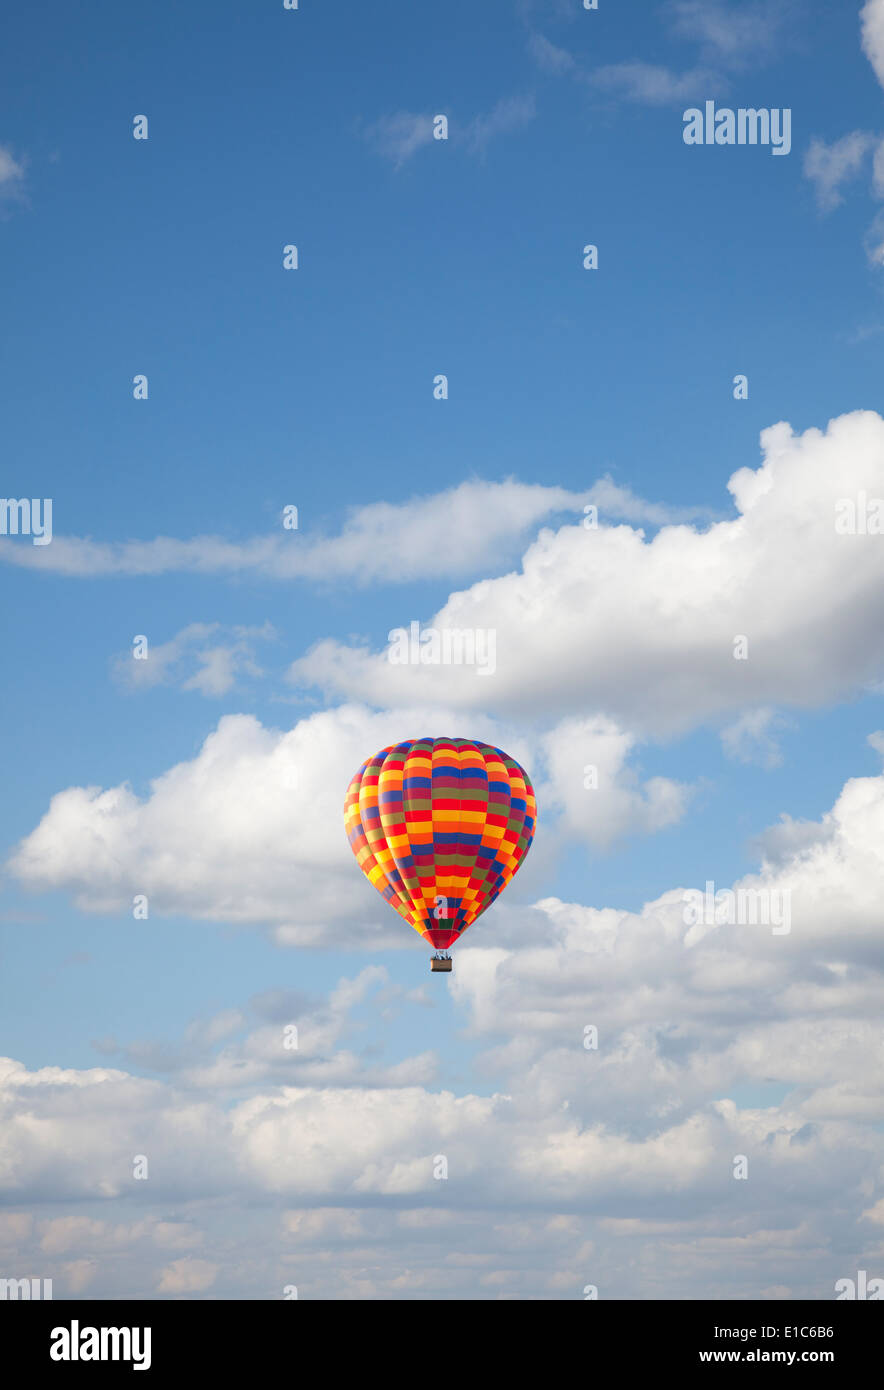 Hot air balloon against blue sky - Stock Image